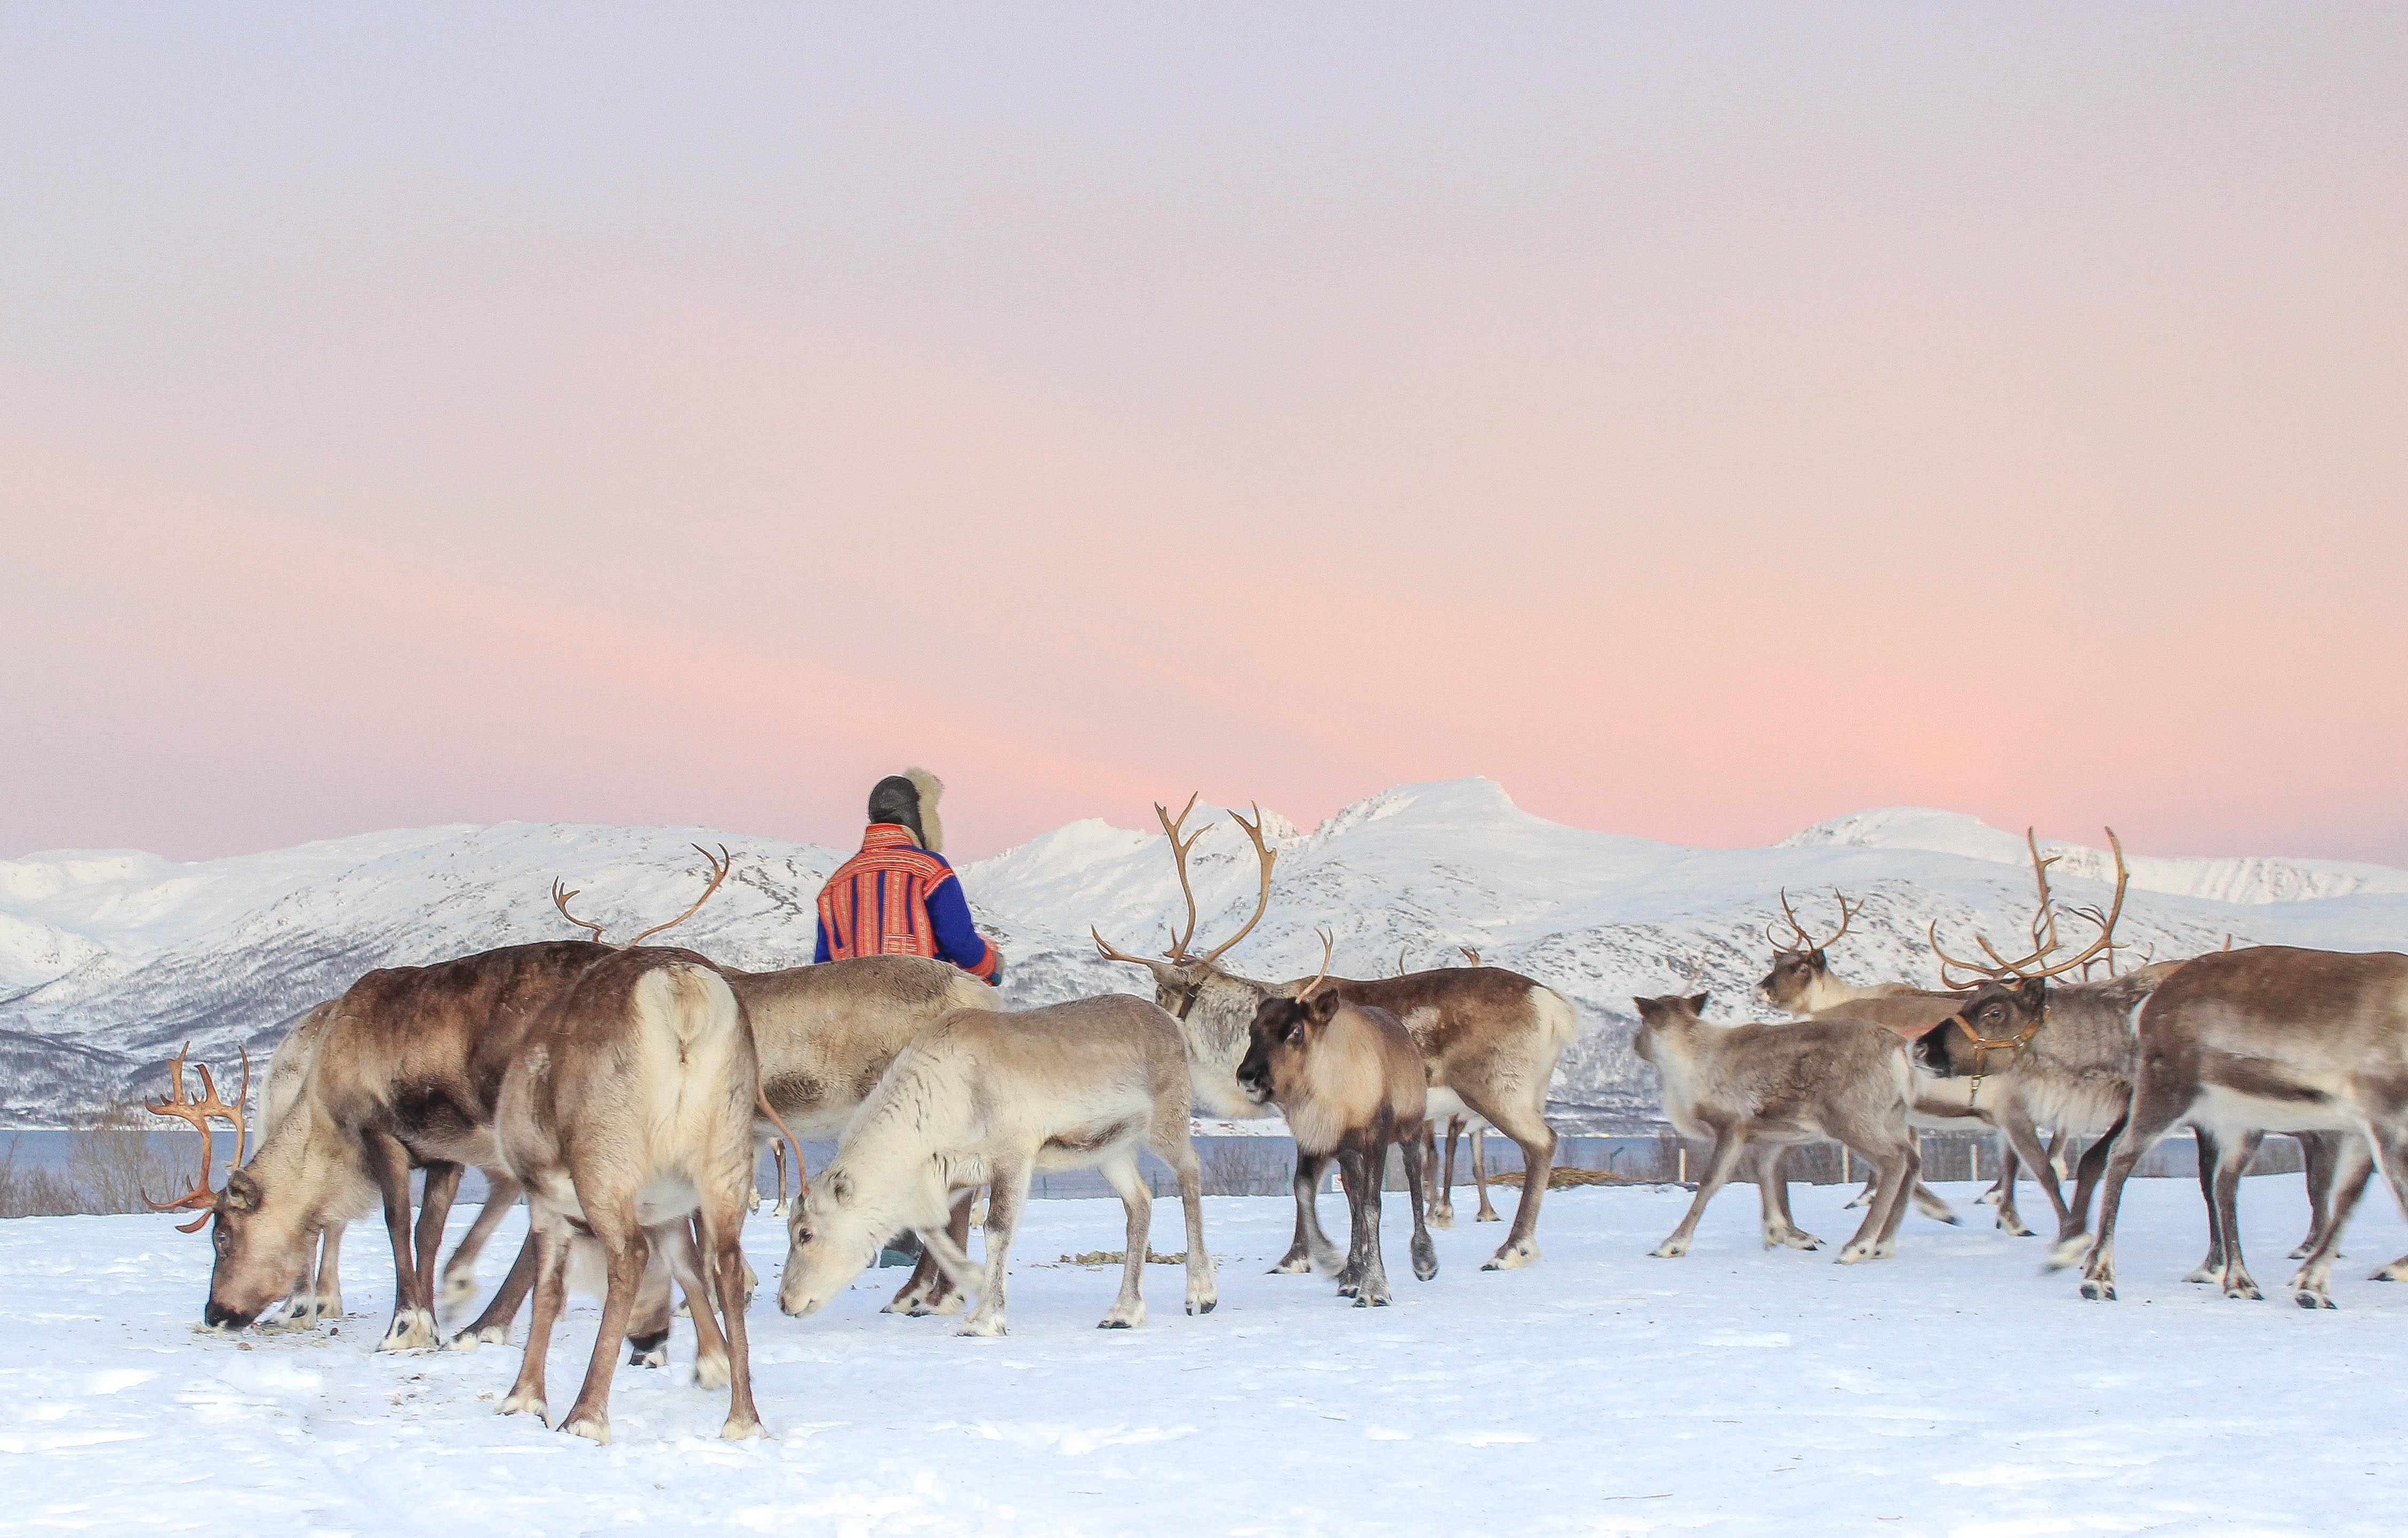 Reindeer Feeding photo Piaa Kempinen.jpg